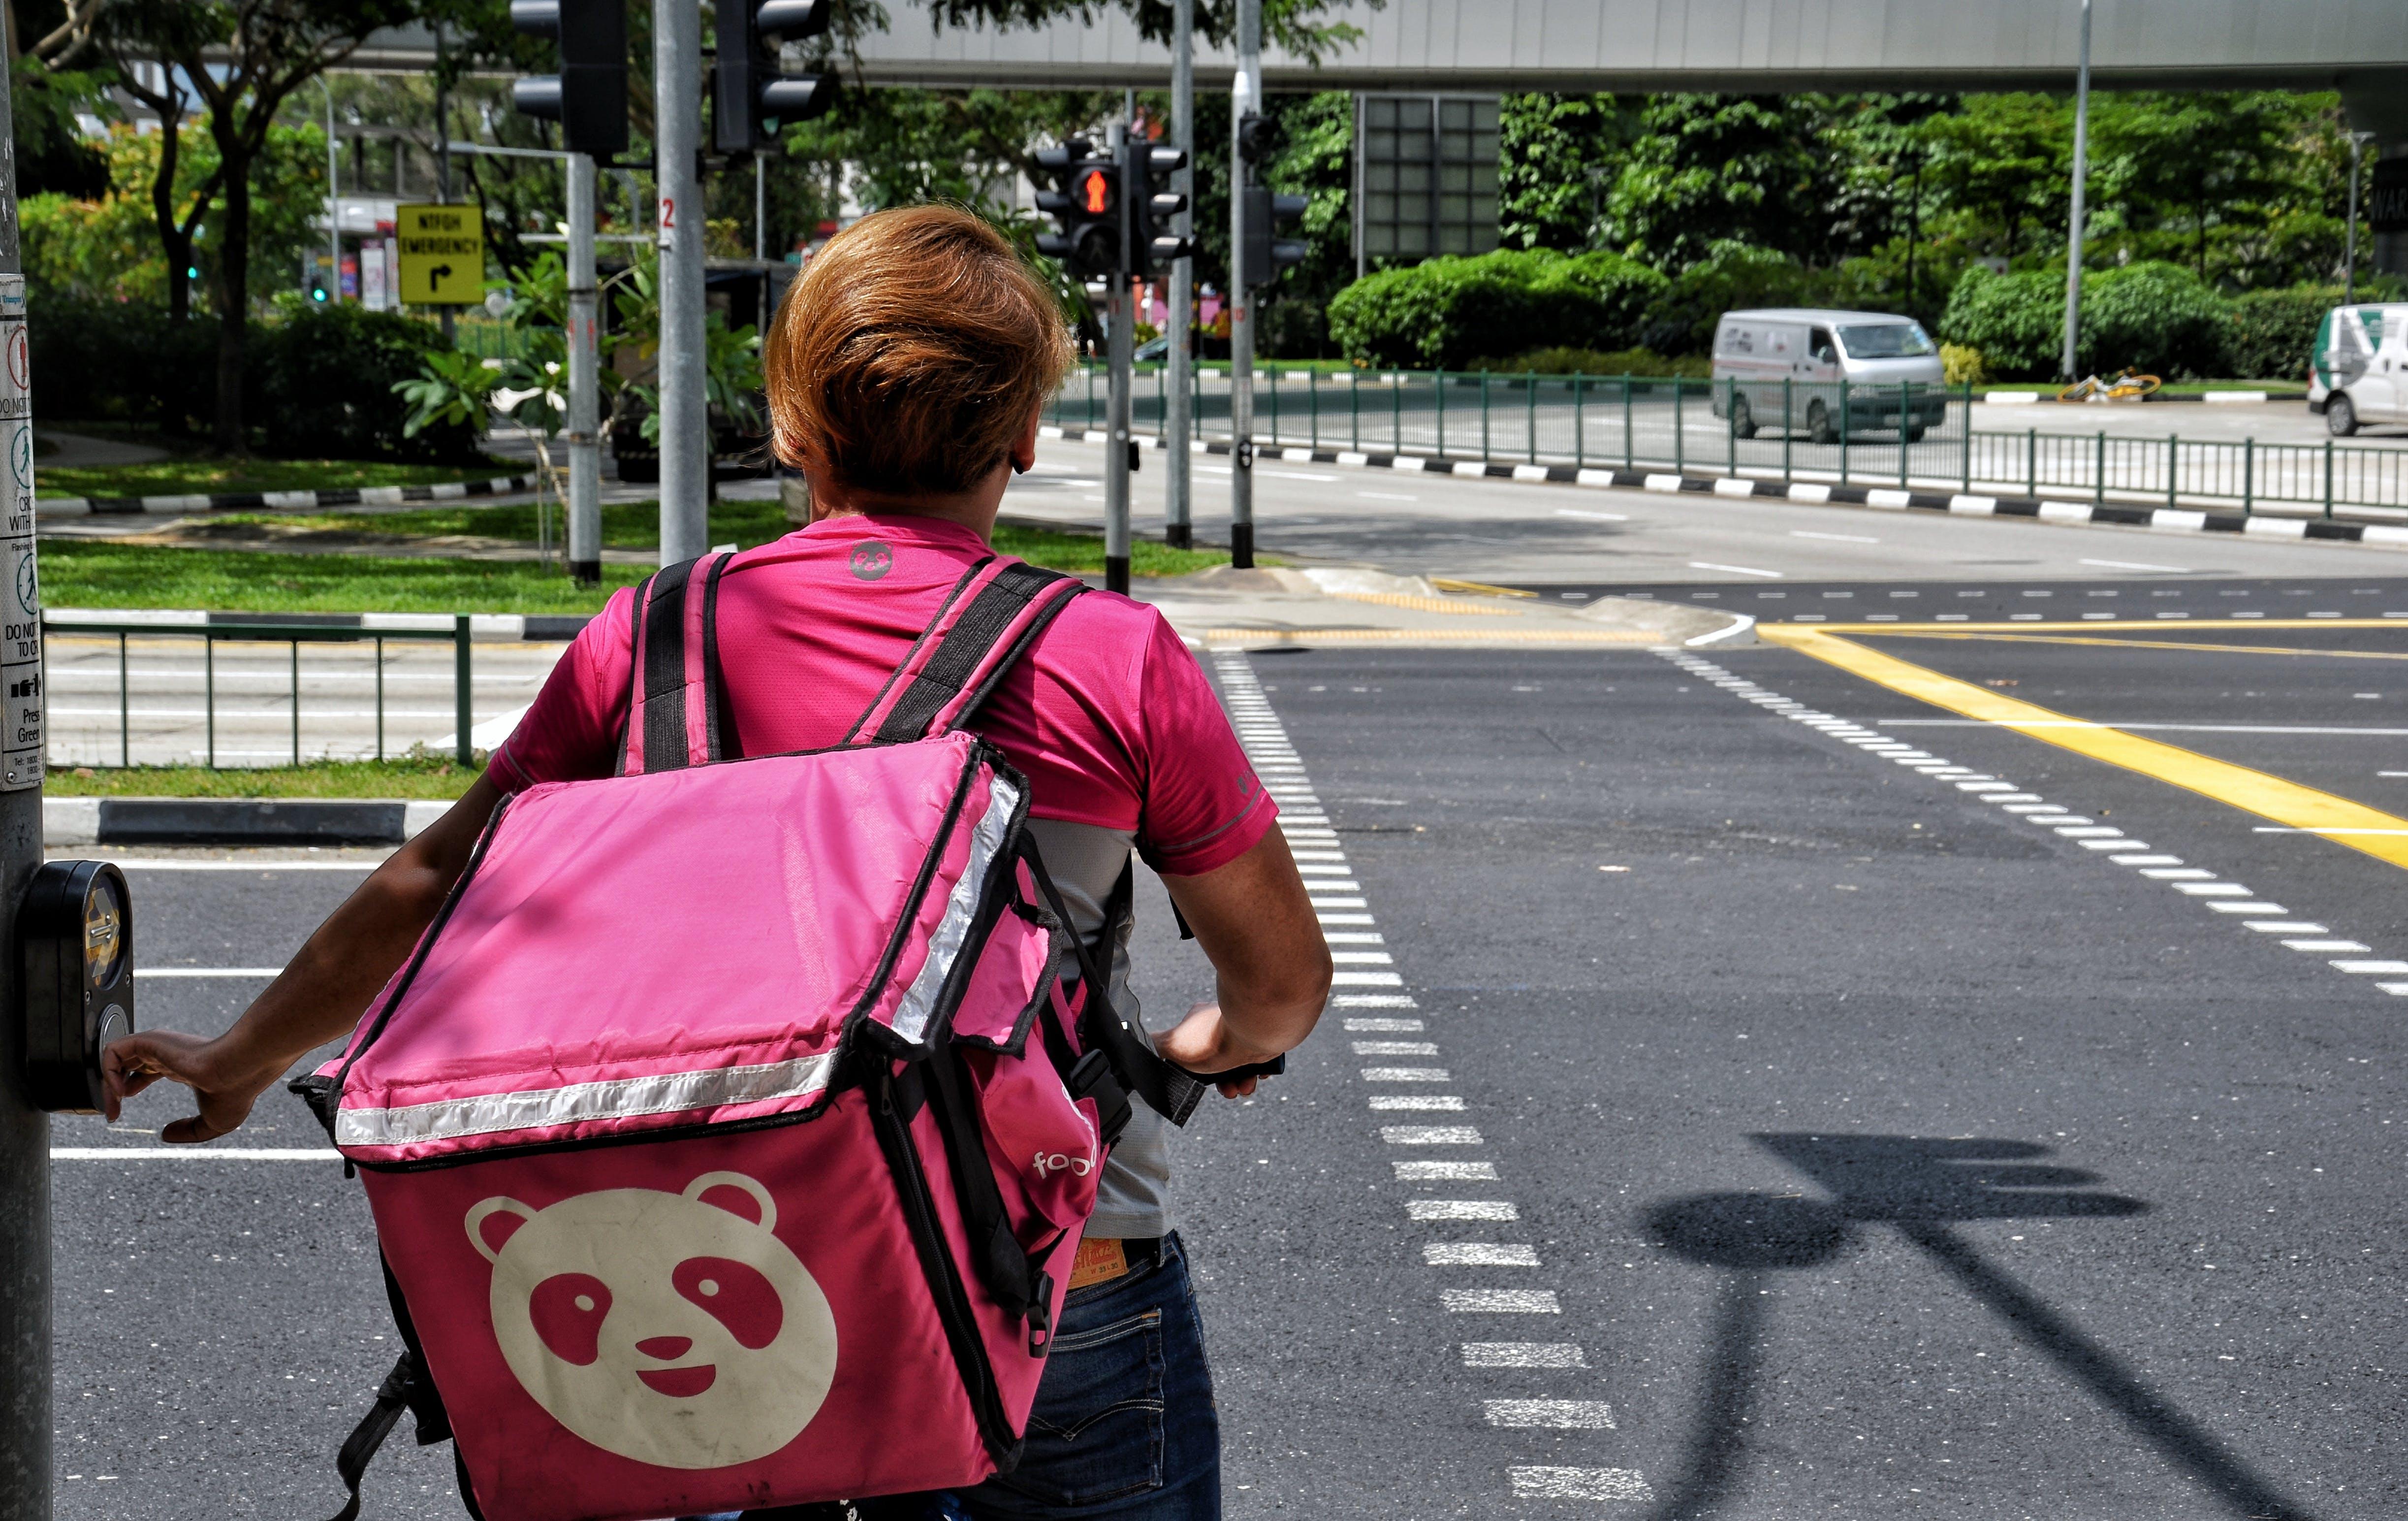 Free stock photo of Electricbike, food delivery, Food panda, Food panda singapore